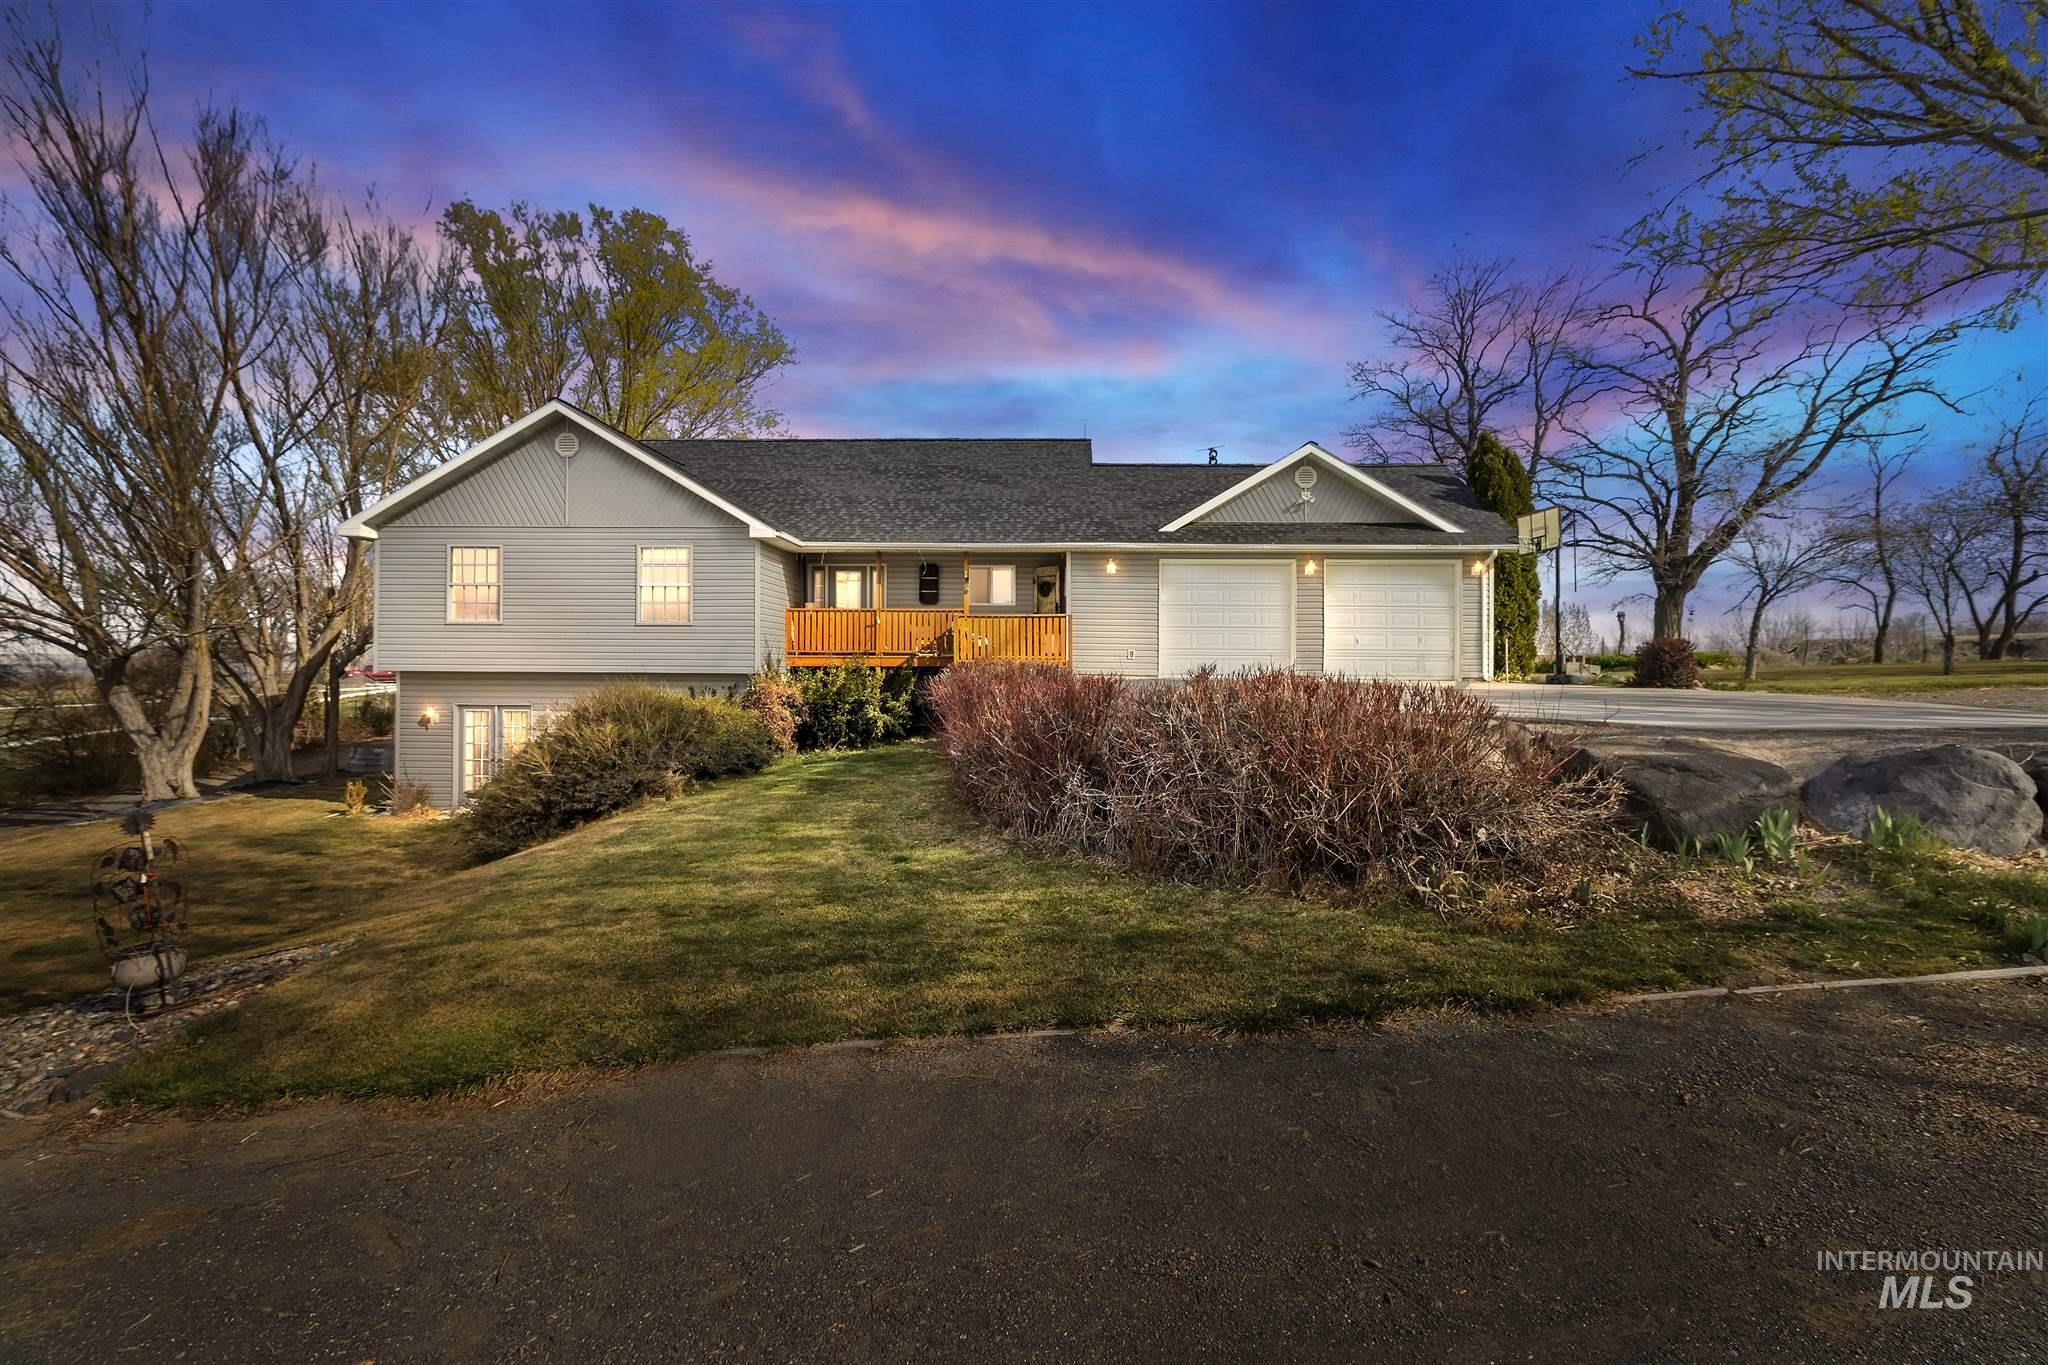 1354 E 4400 N Property Photo - Buhl, ID real estate listing